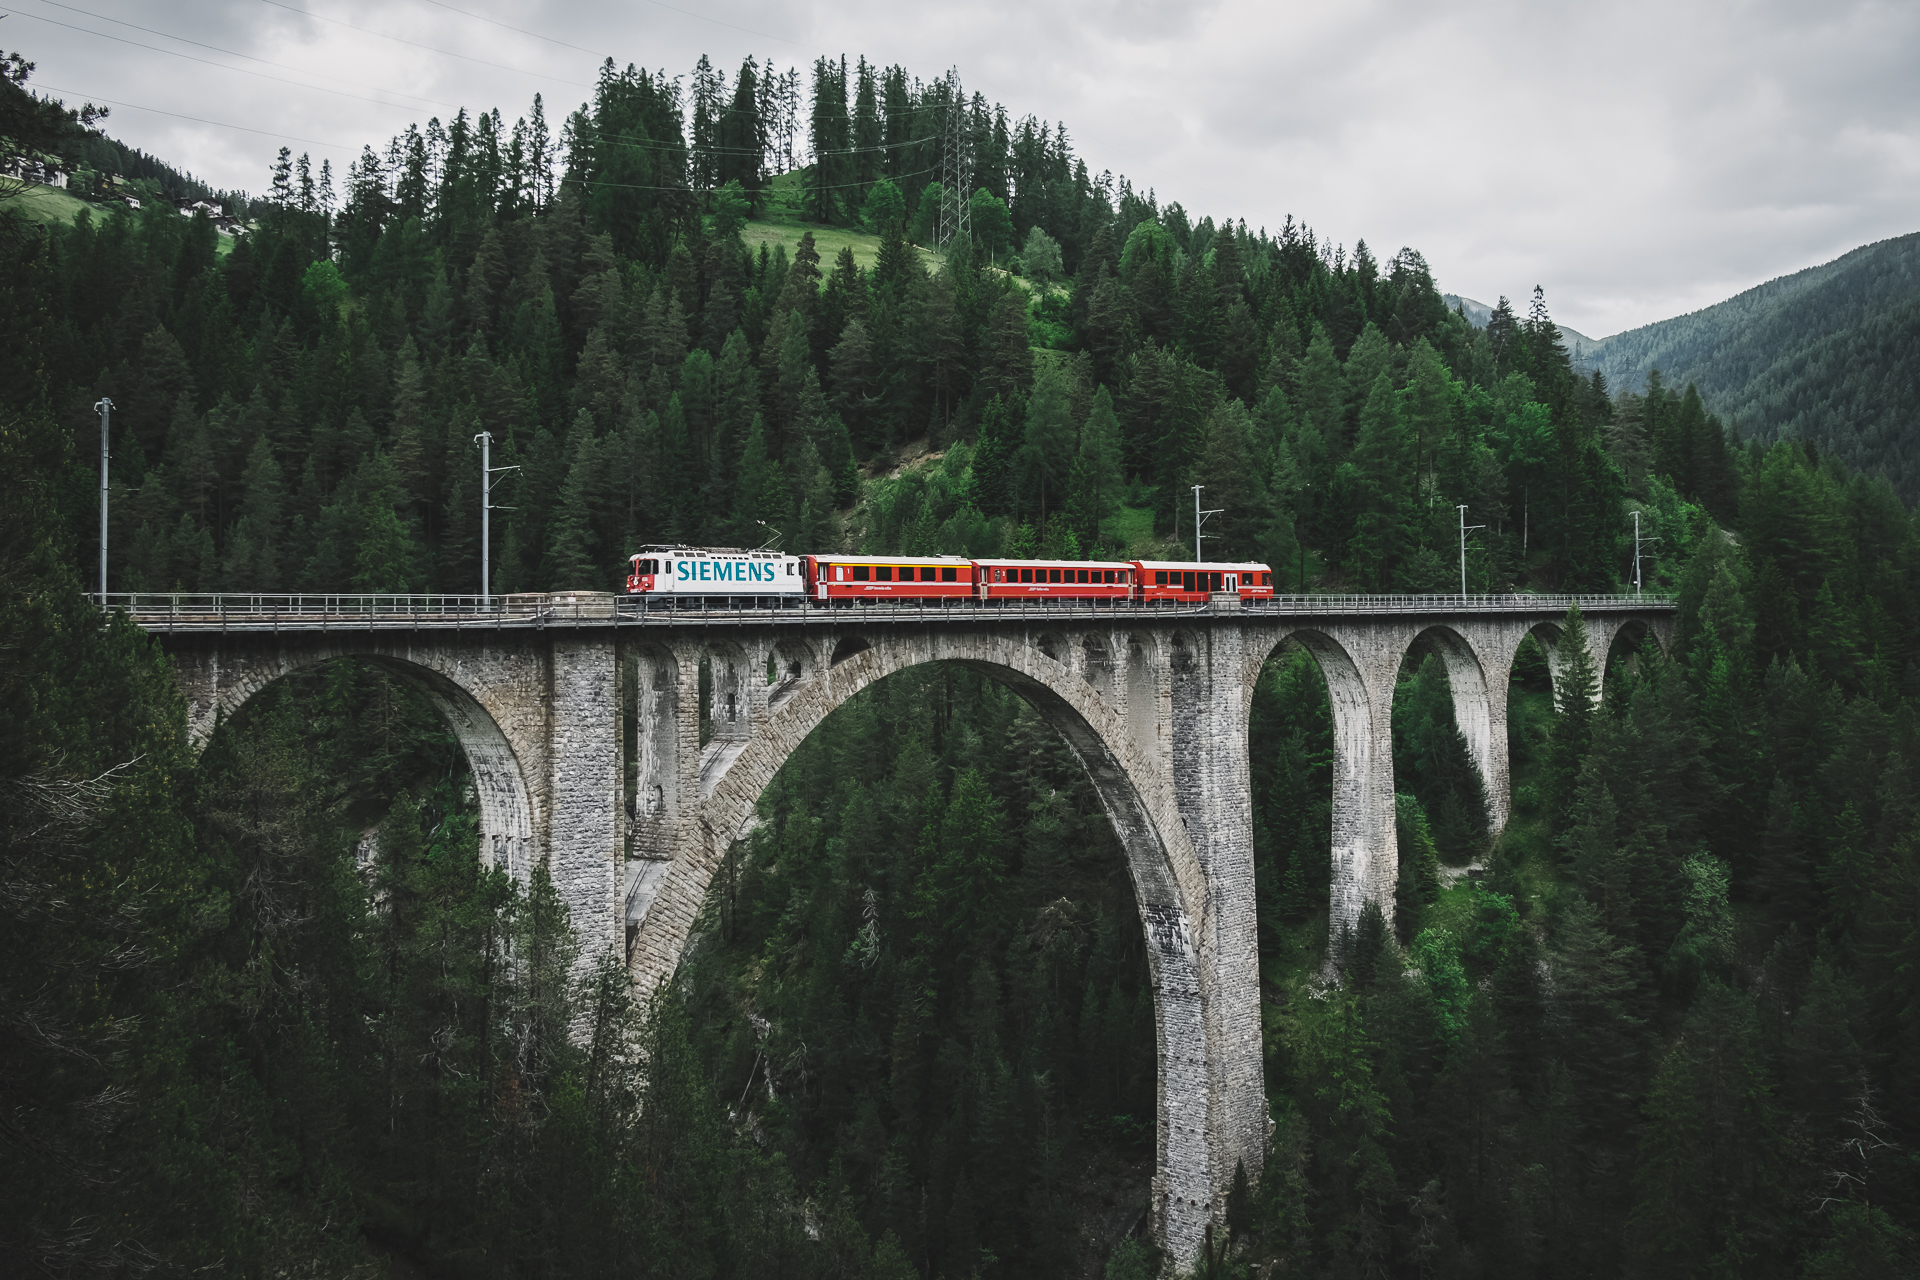 Wiesnerviaduct, Graubunden, Switzerland, Bergun